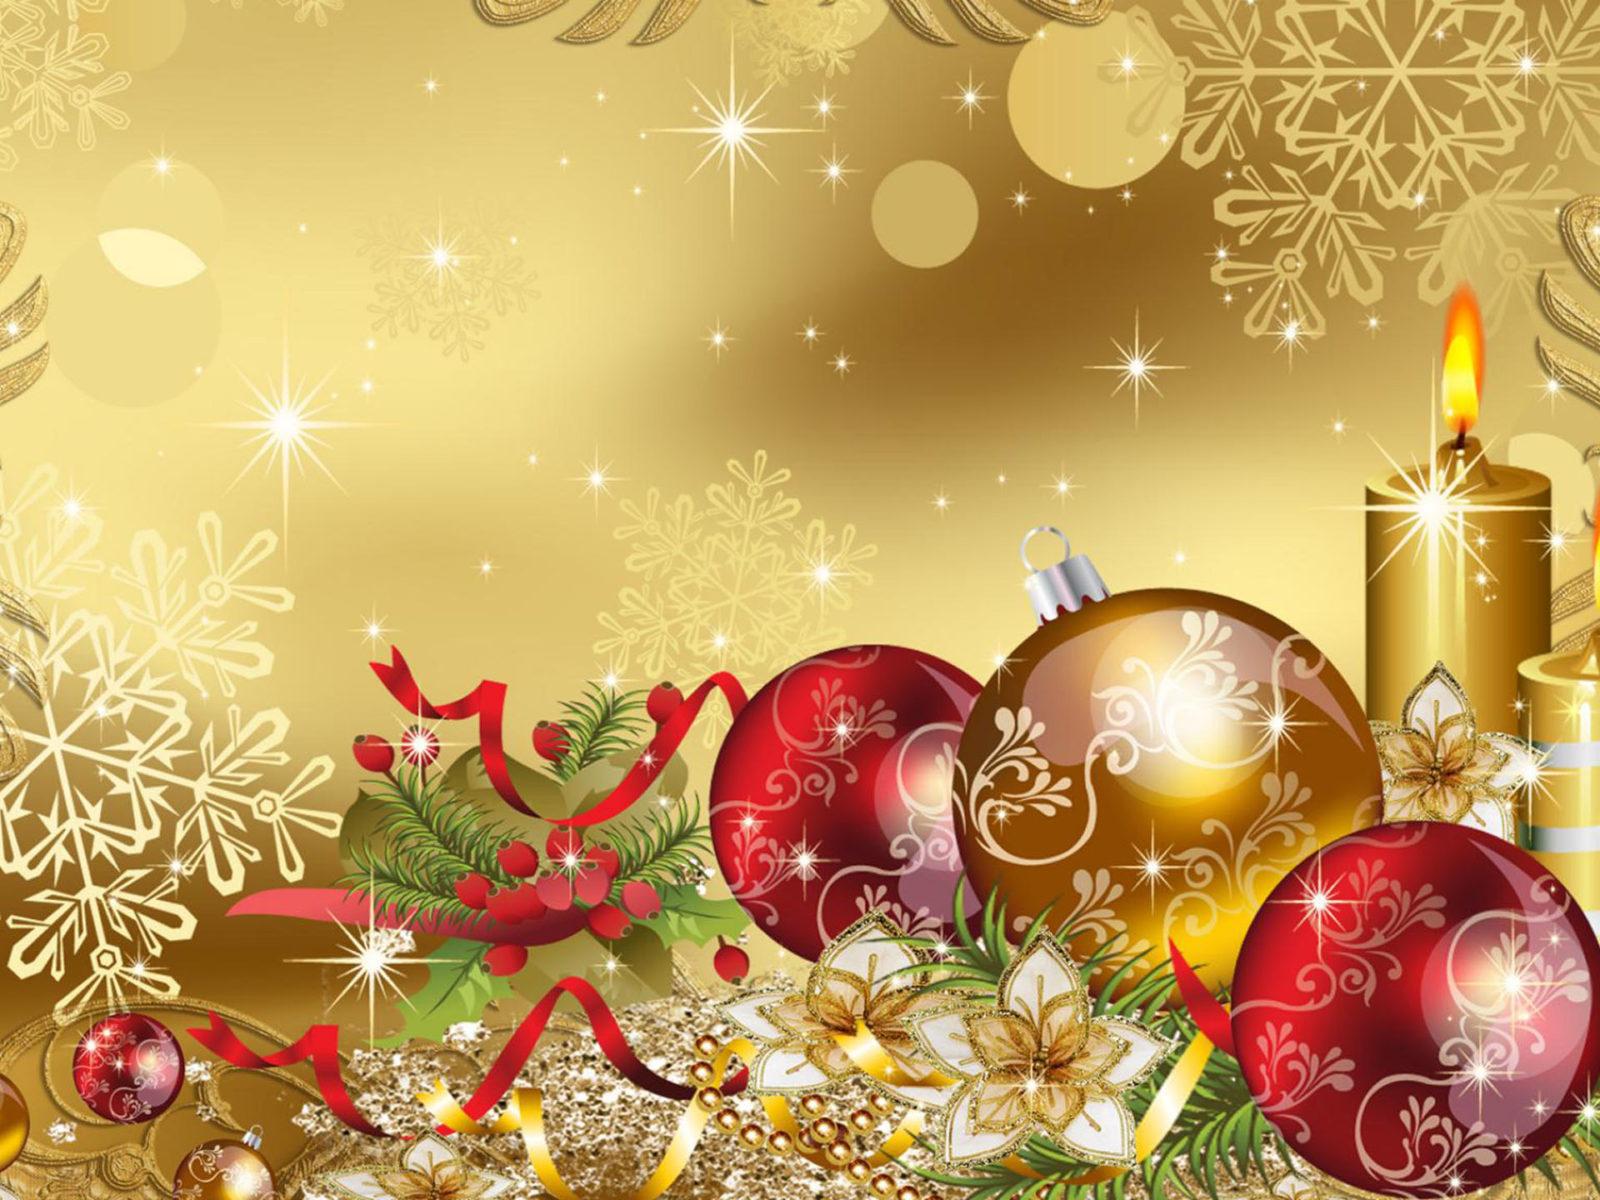 3d Xmas Wallpaper Free Merry Christmas Gold Wallpaper Hd For Desktop 2560x1440